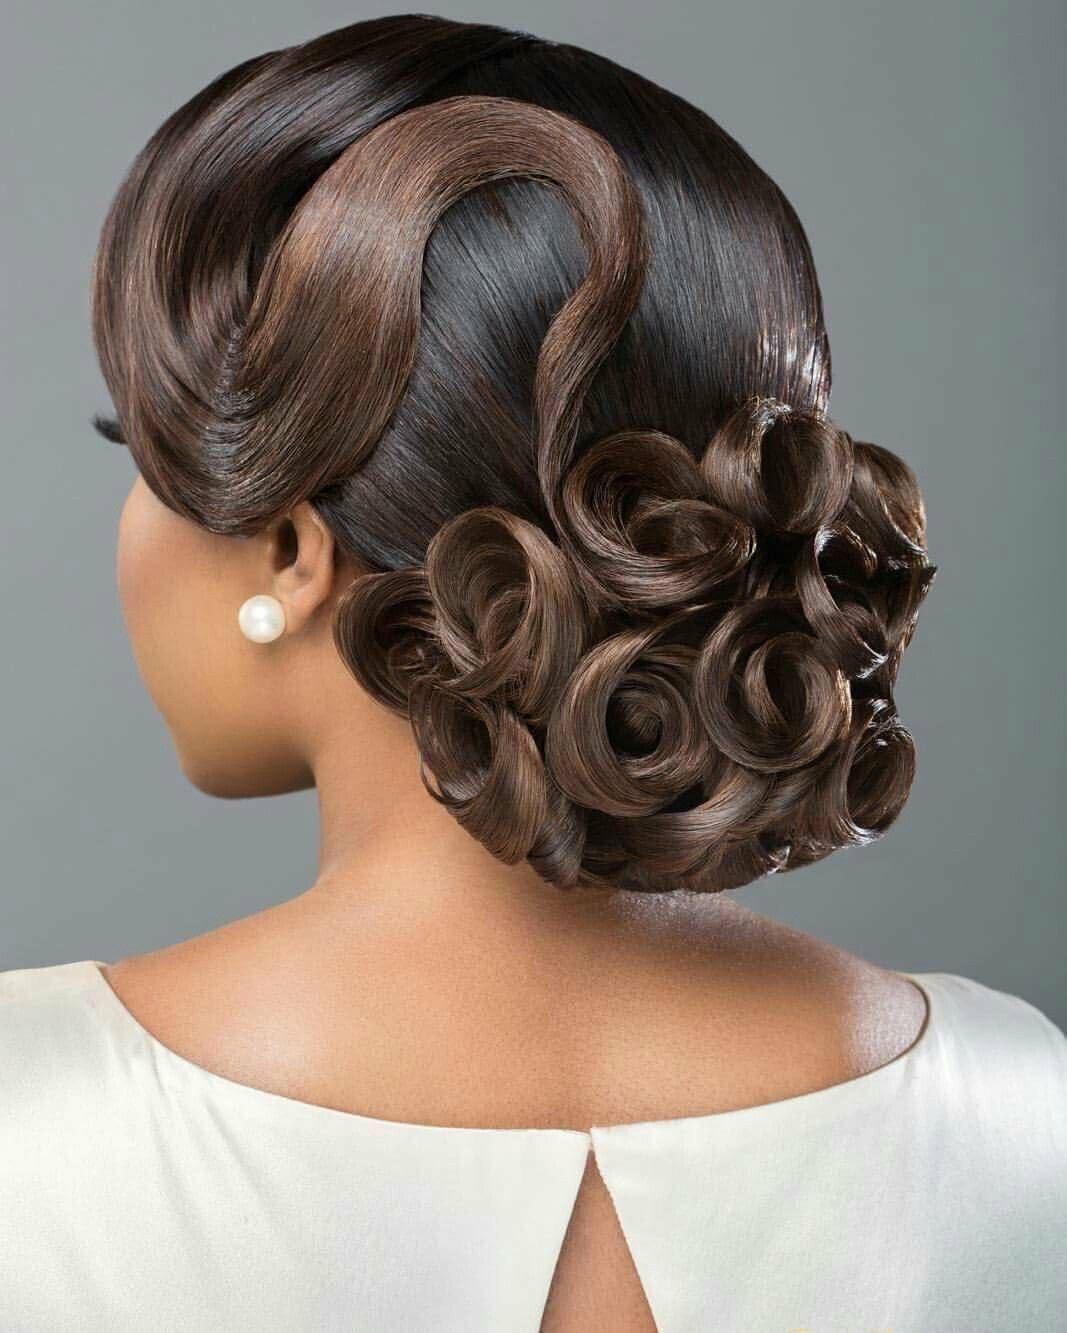 Pics of black prom hair styles — photo 13